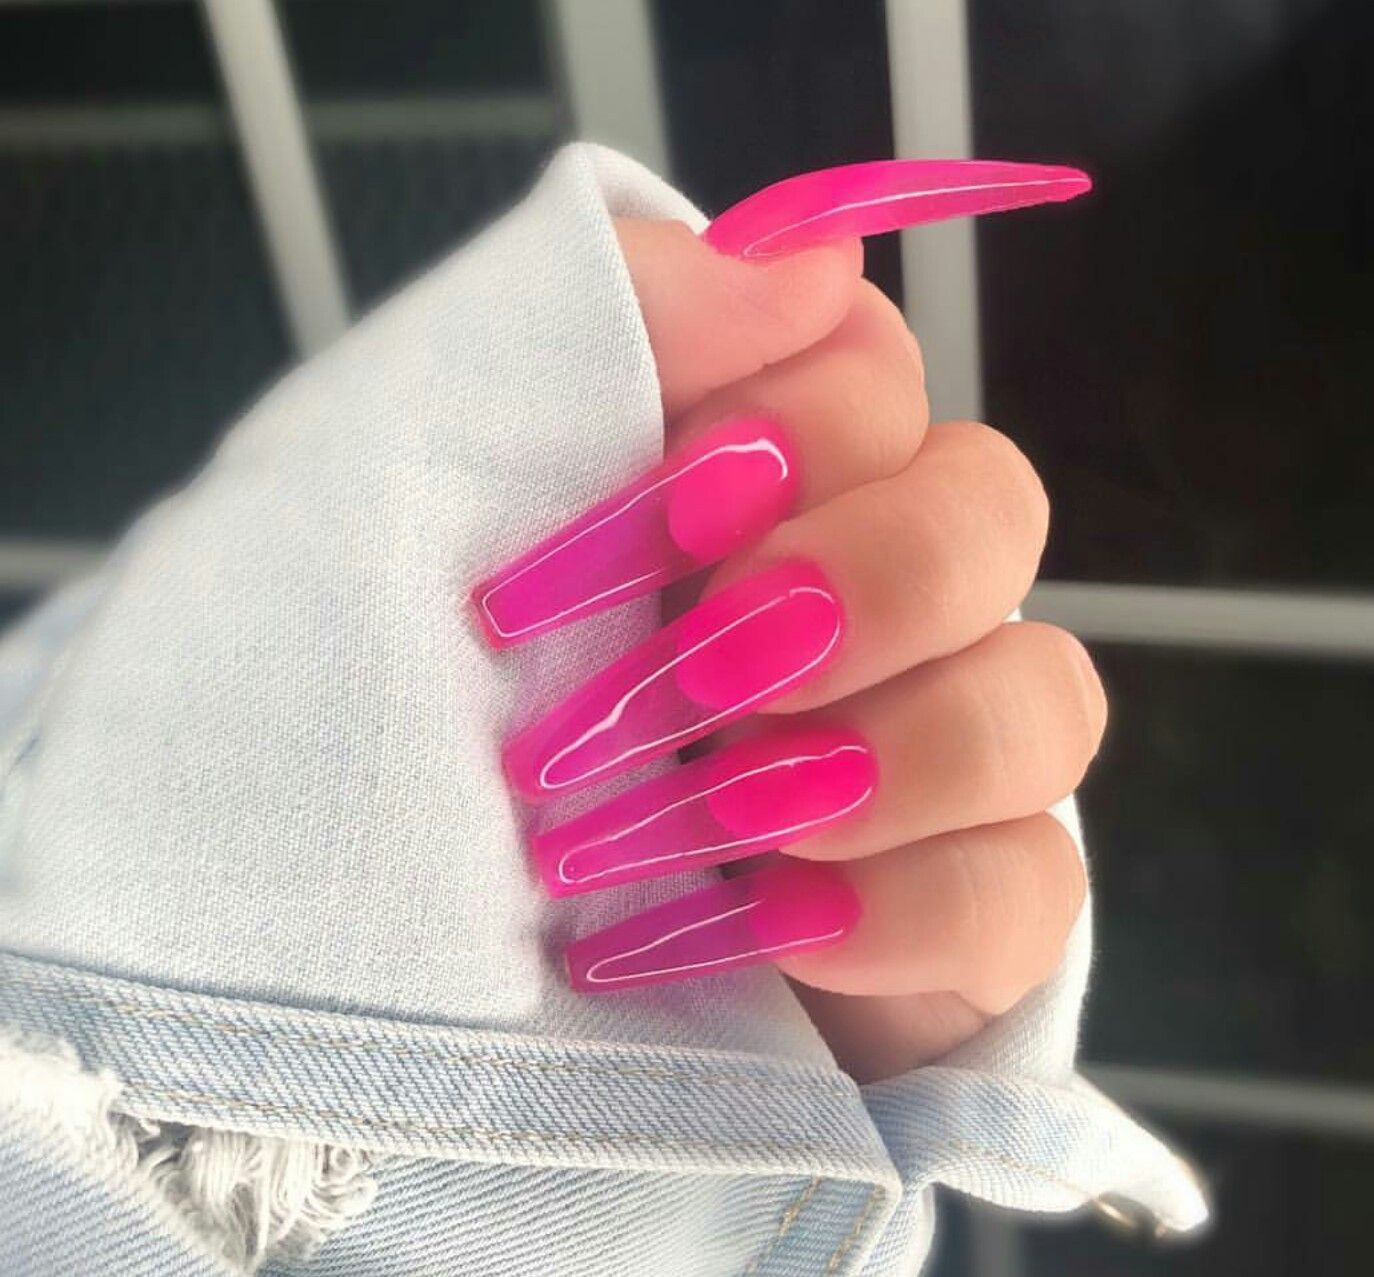 Hot Pink Clear Nails Pink Acrylic Nails Jelly Nails Clear Nails